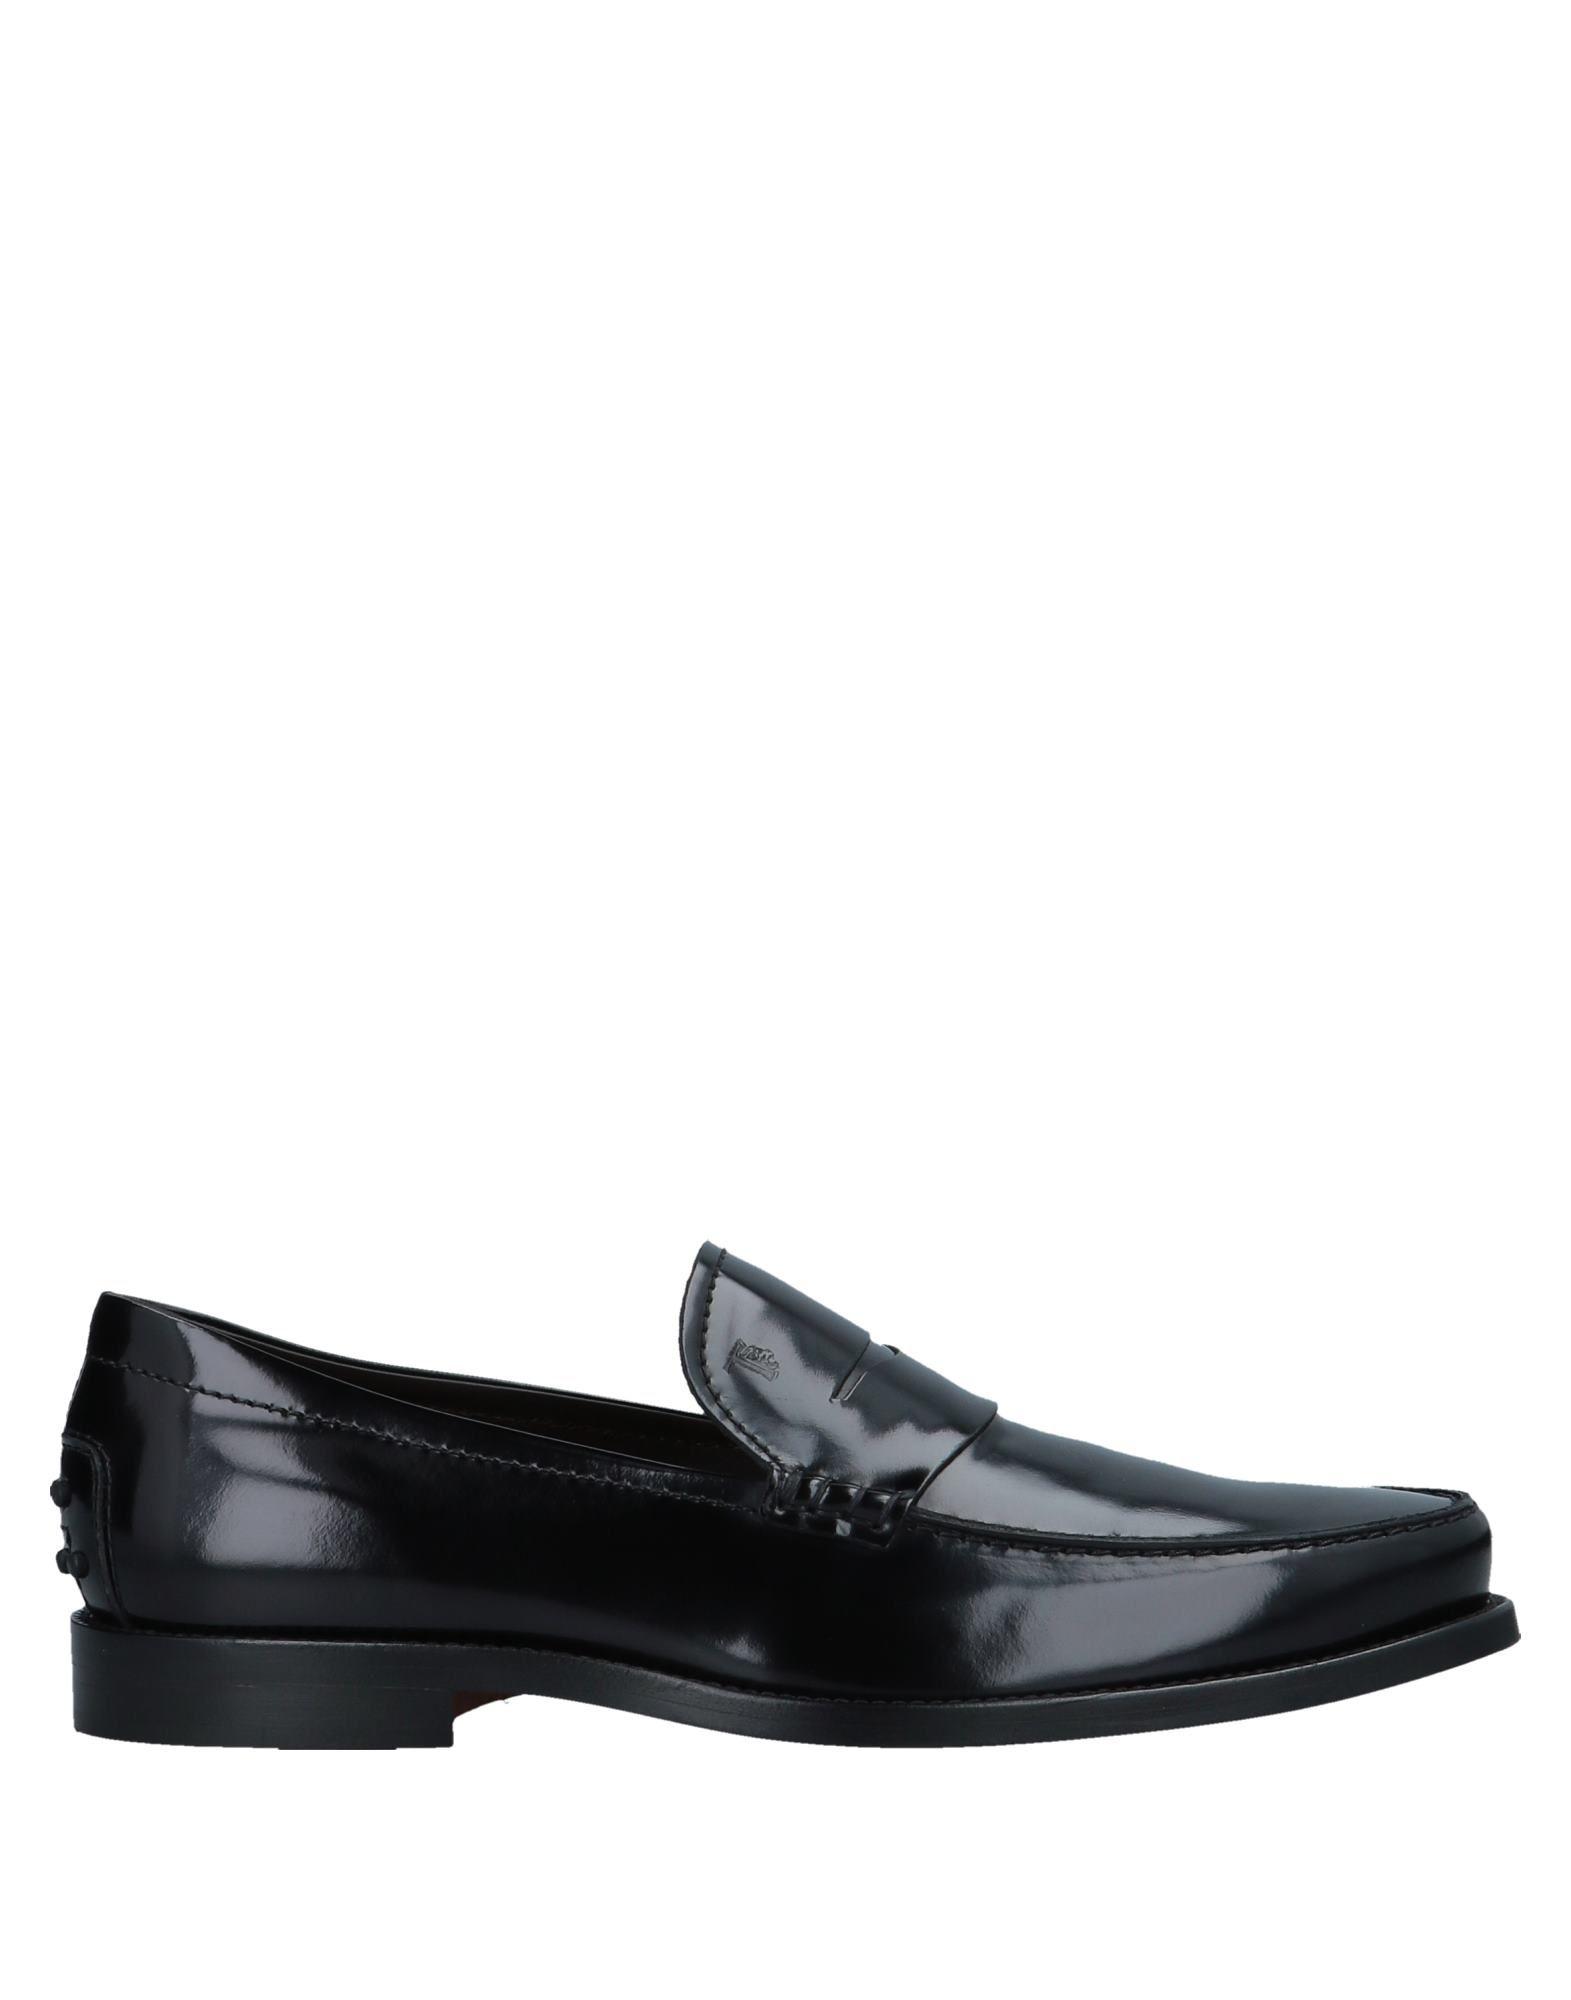 Tod's Mokassins Herren  11316696UE Gute Qualität beliebte Schuhe